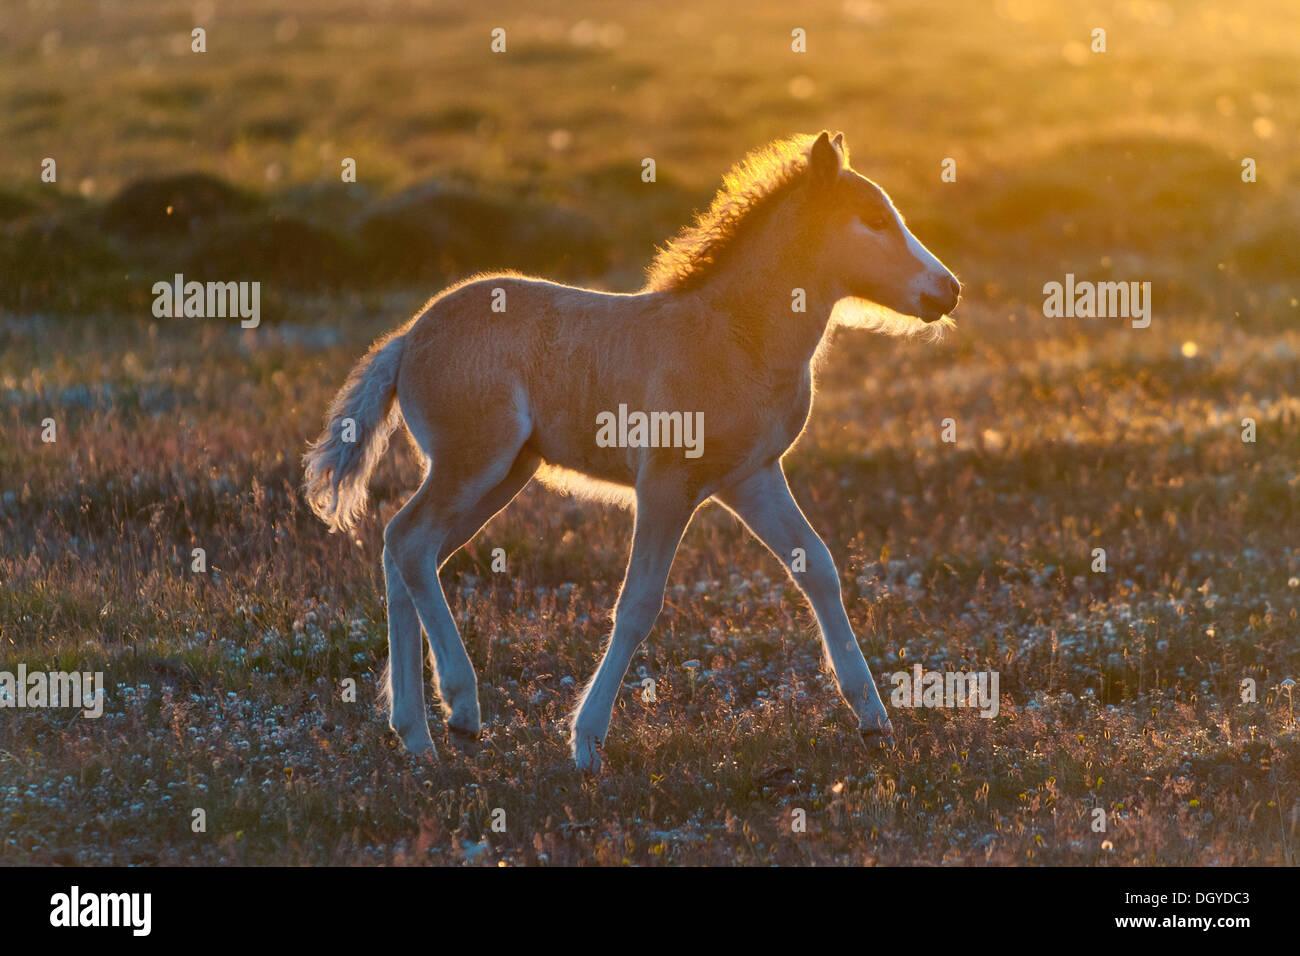 Foal, Iceland horse, Hofsós, Skagafjoerdur bay, northern Iceland, Iceland, Europe - Stock Image